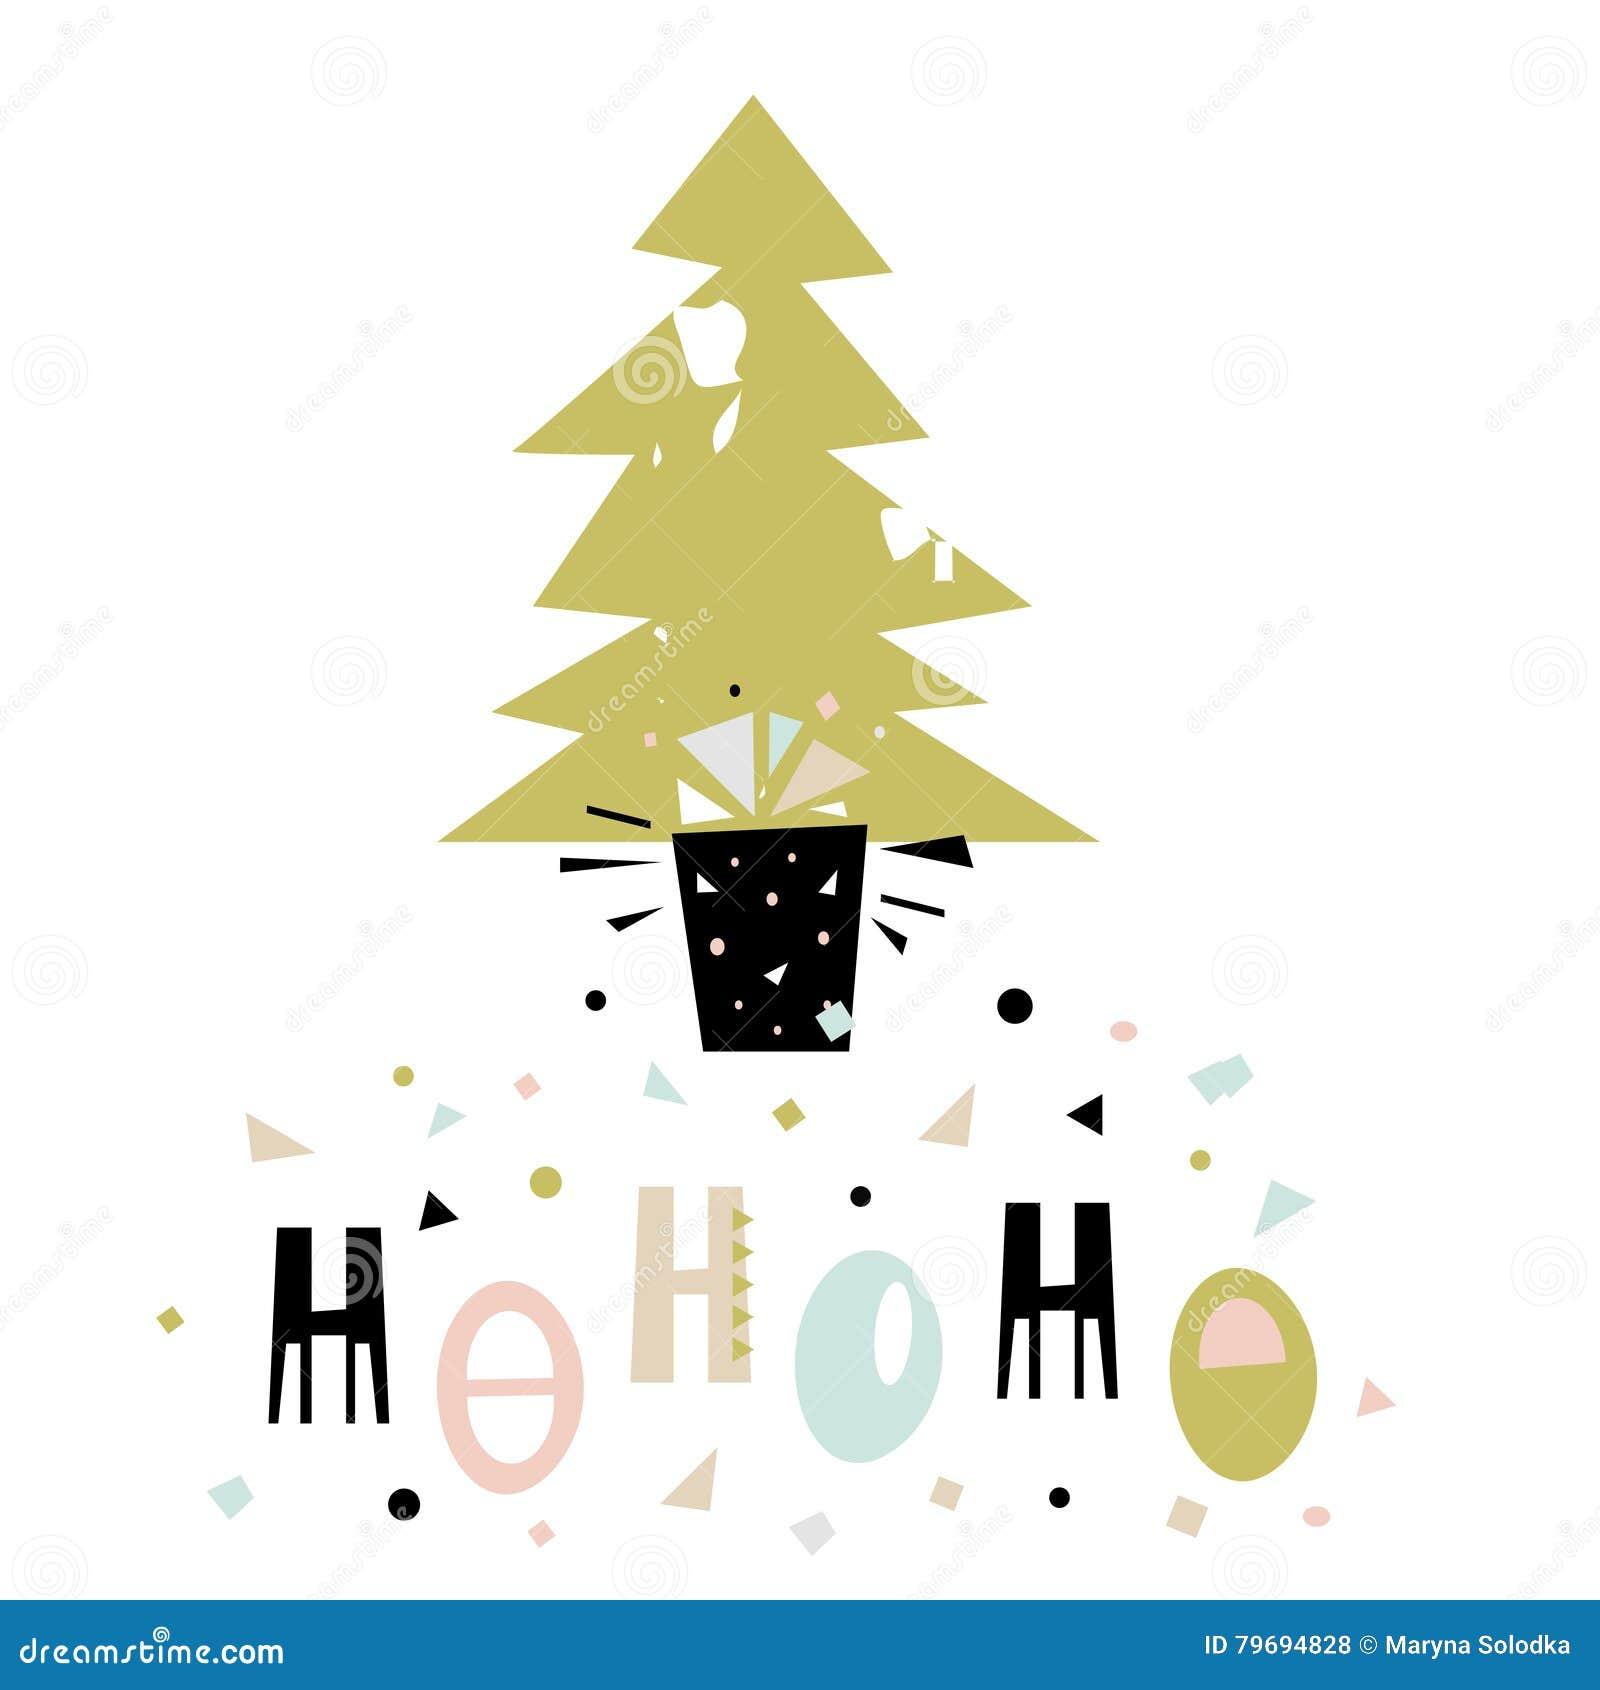 Hohoho winter saying christmas greeting background holiday hohoho winter saying christmas greeting background holiday winter template with christmas tree and gift vector illustration m4hsunfo